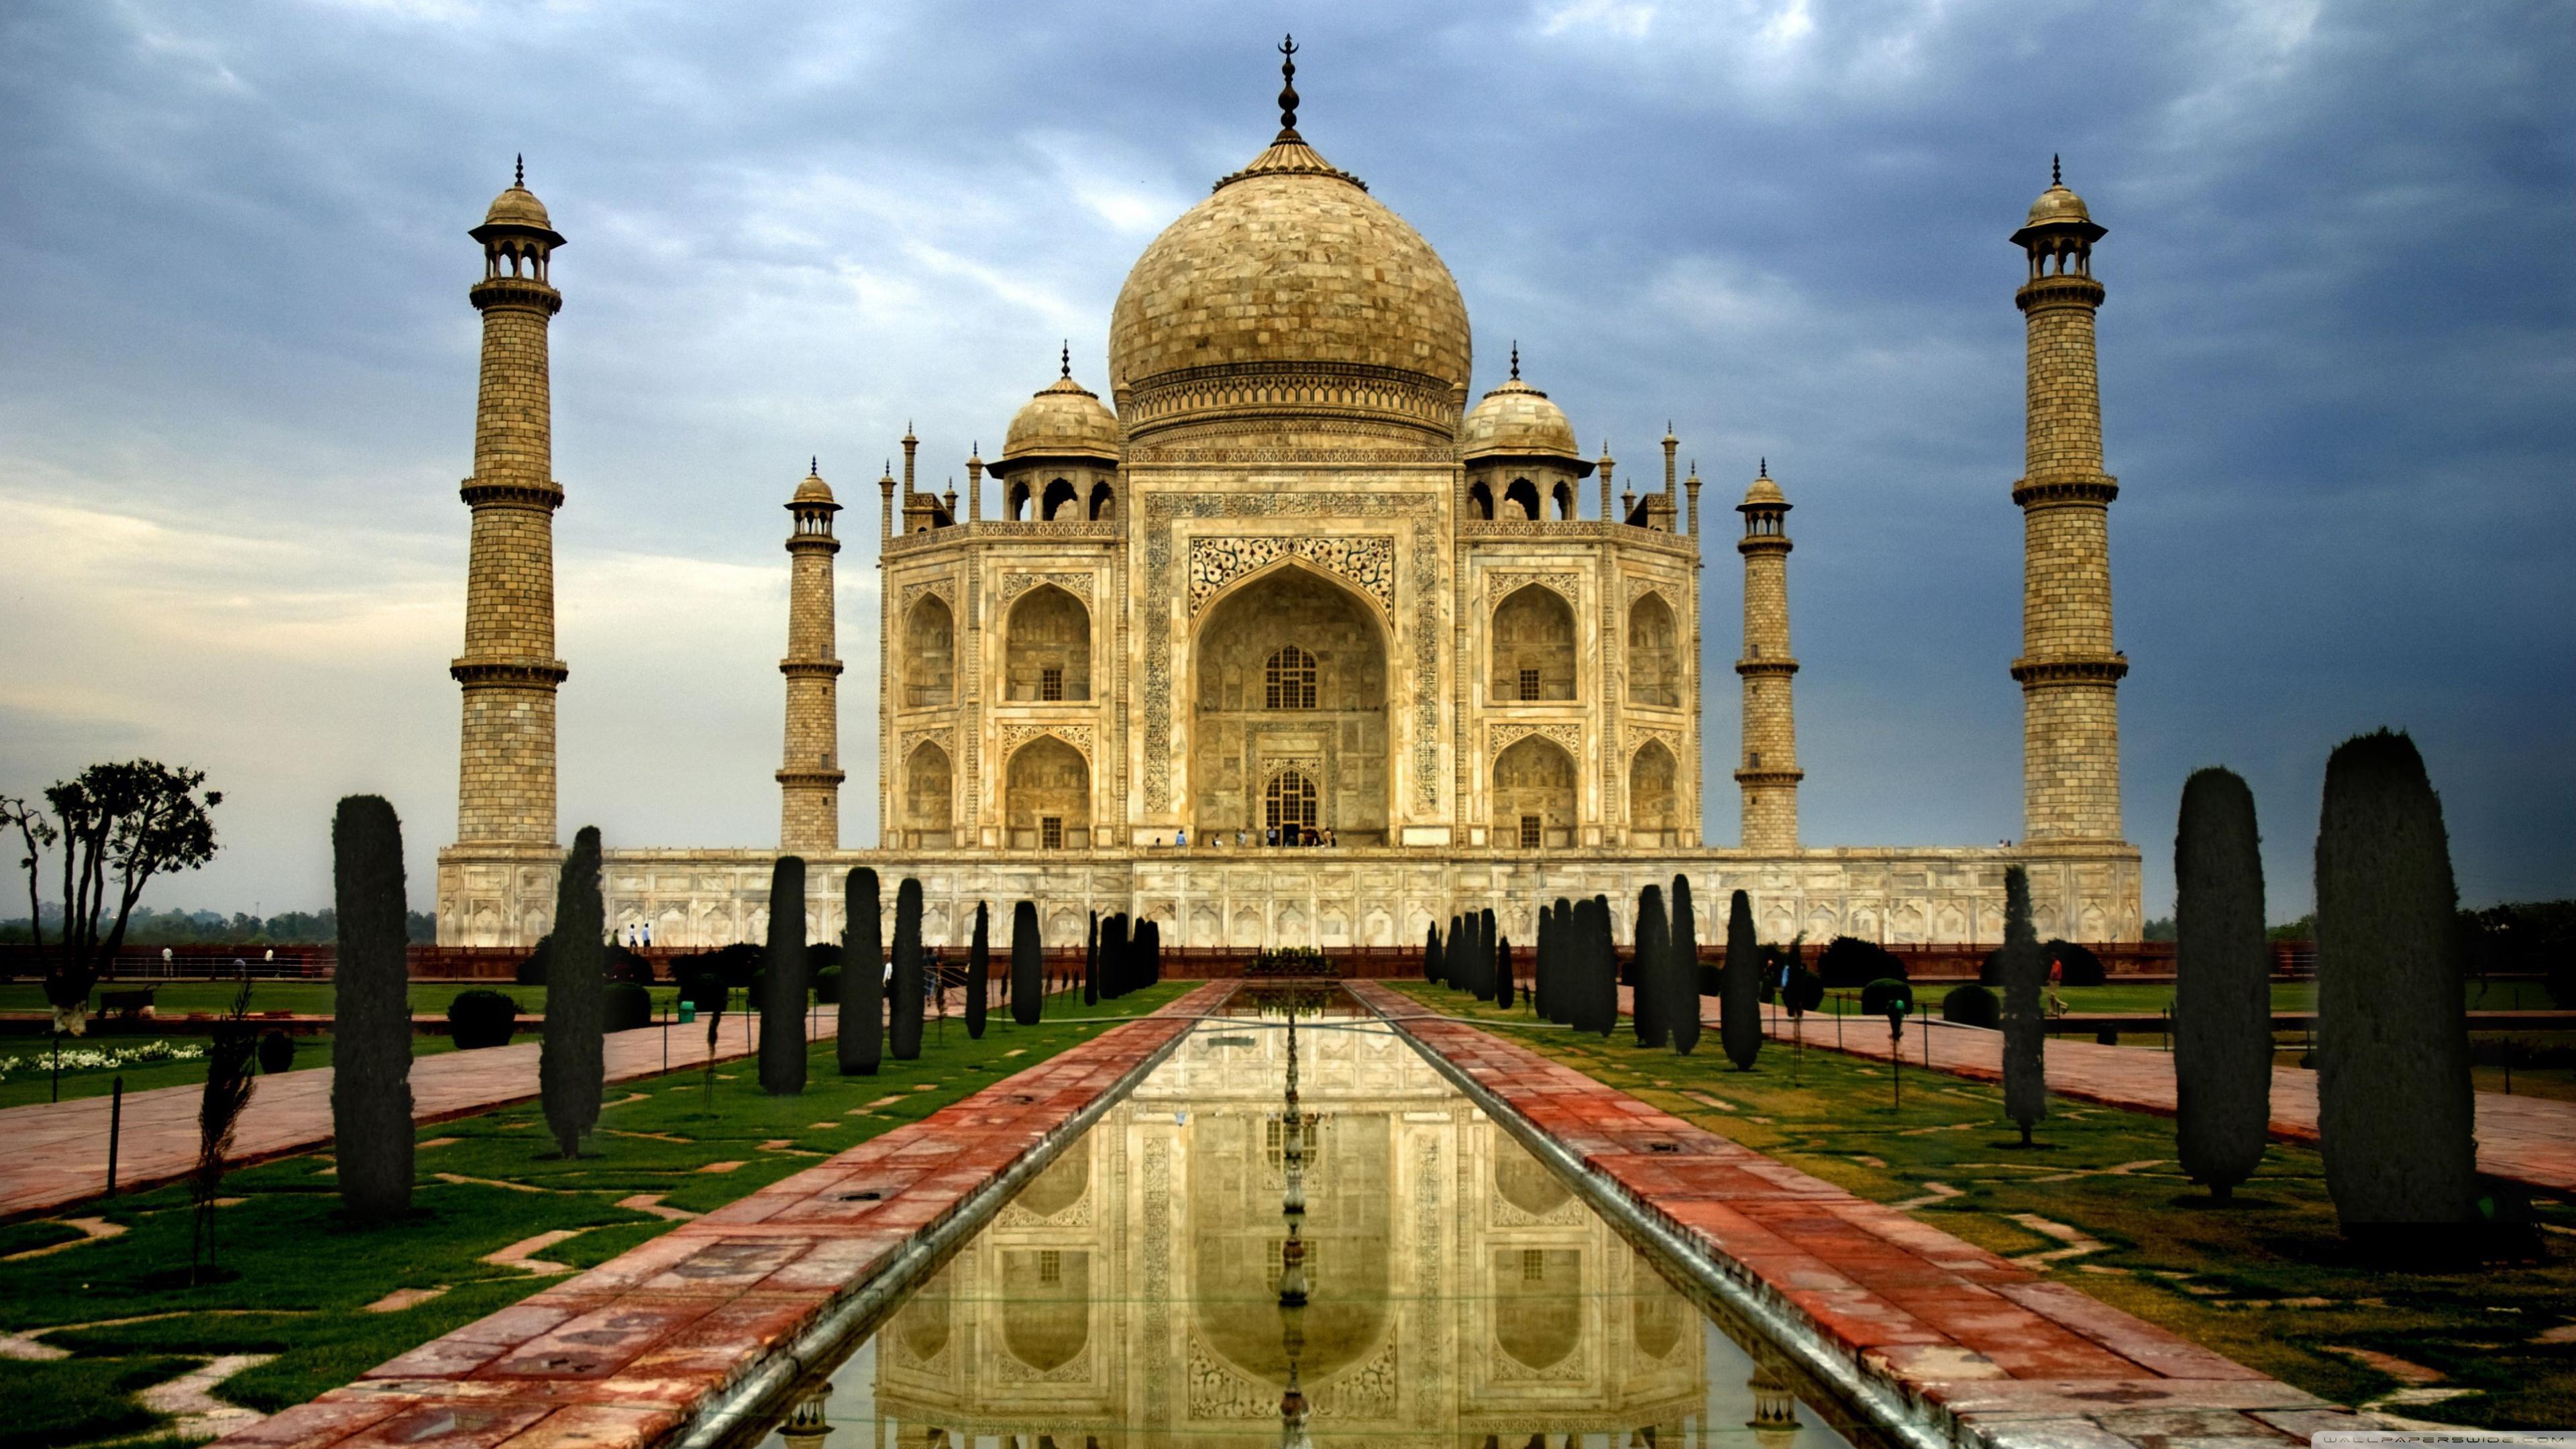 India Taj Mahal Trippy Background